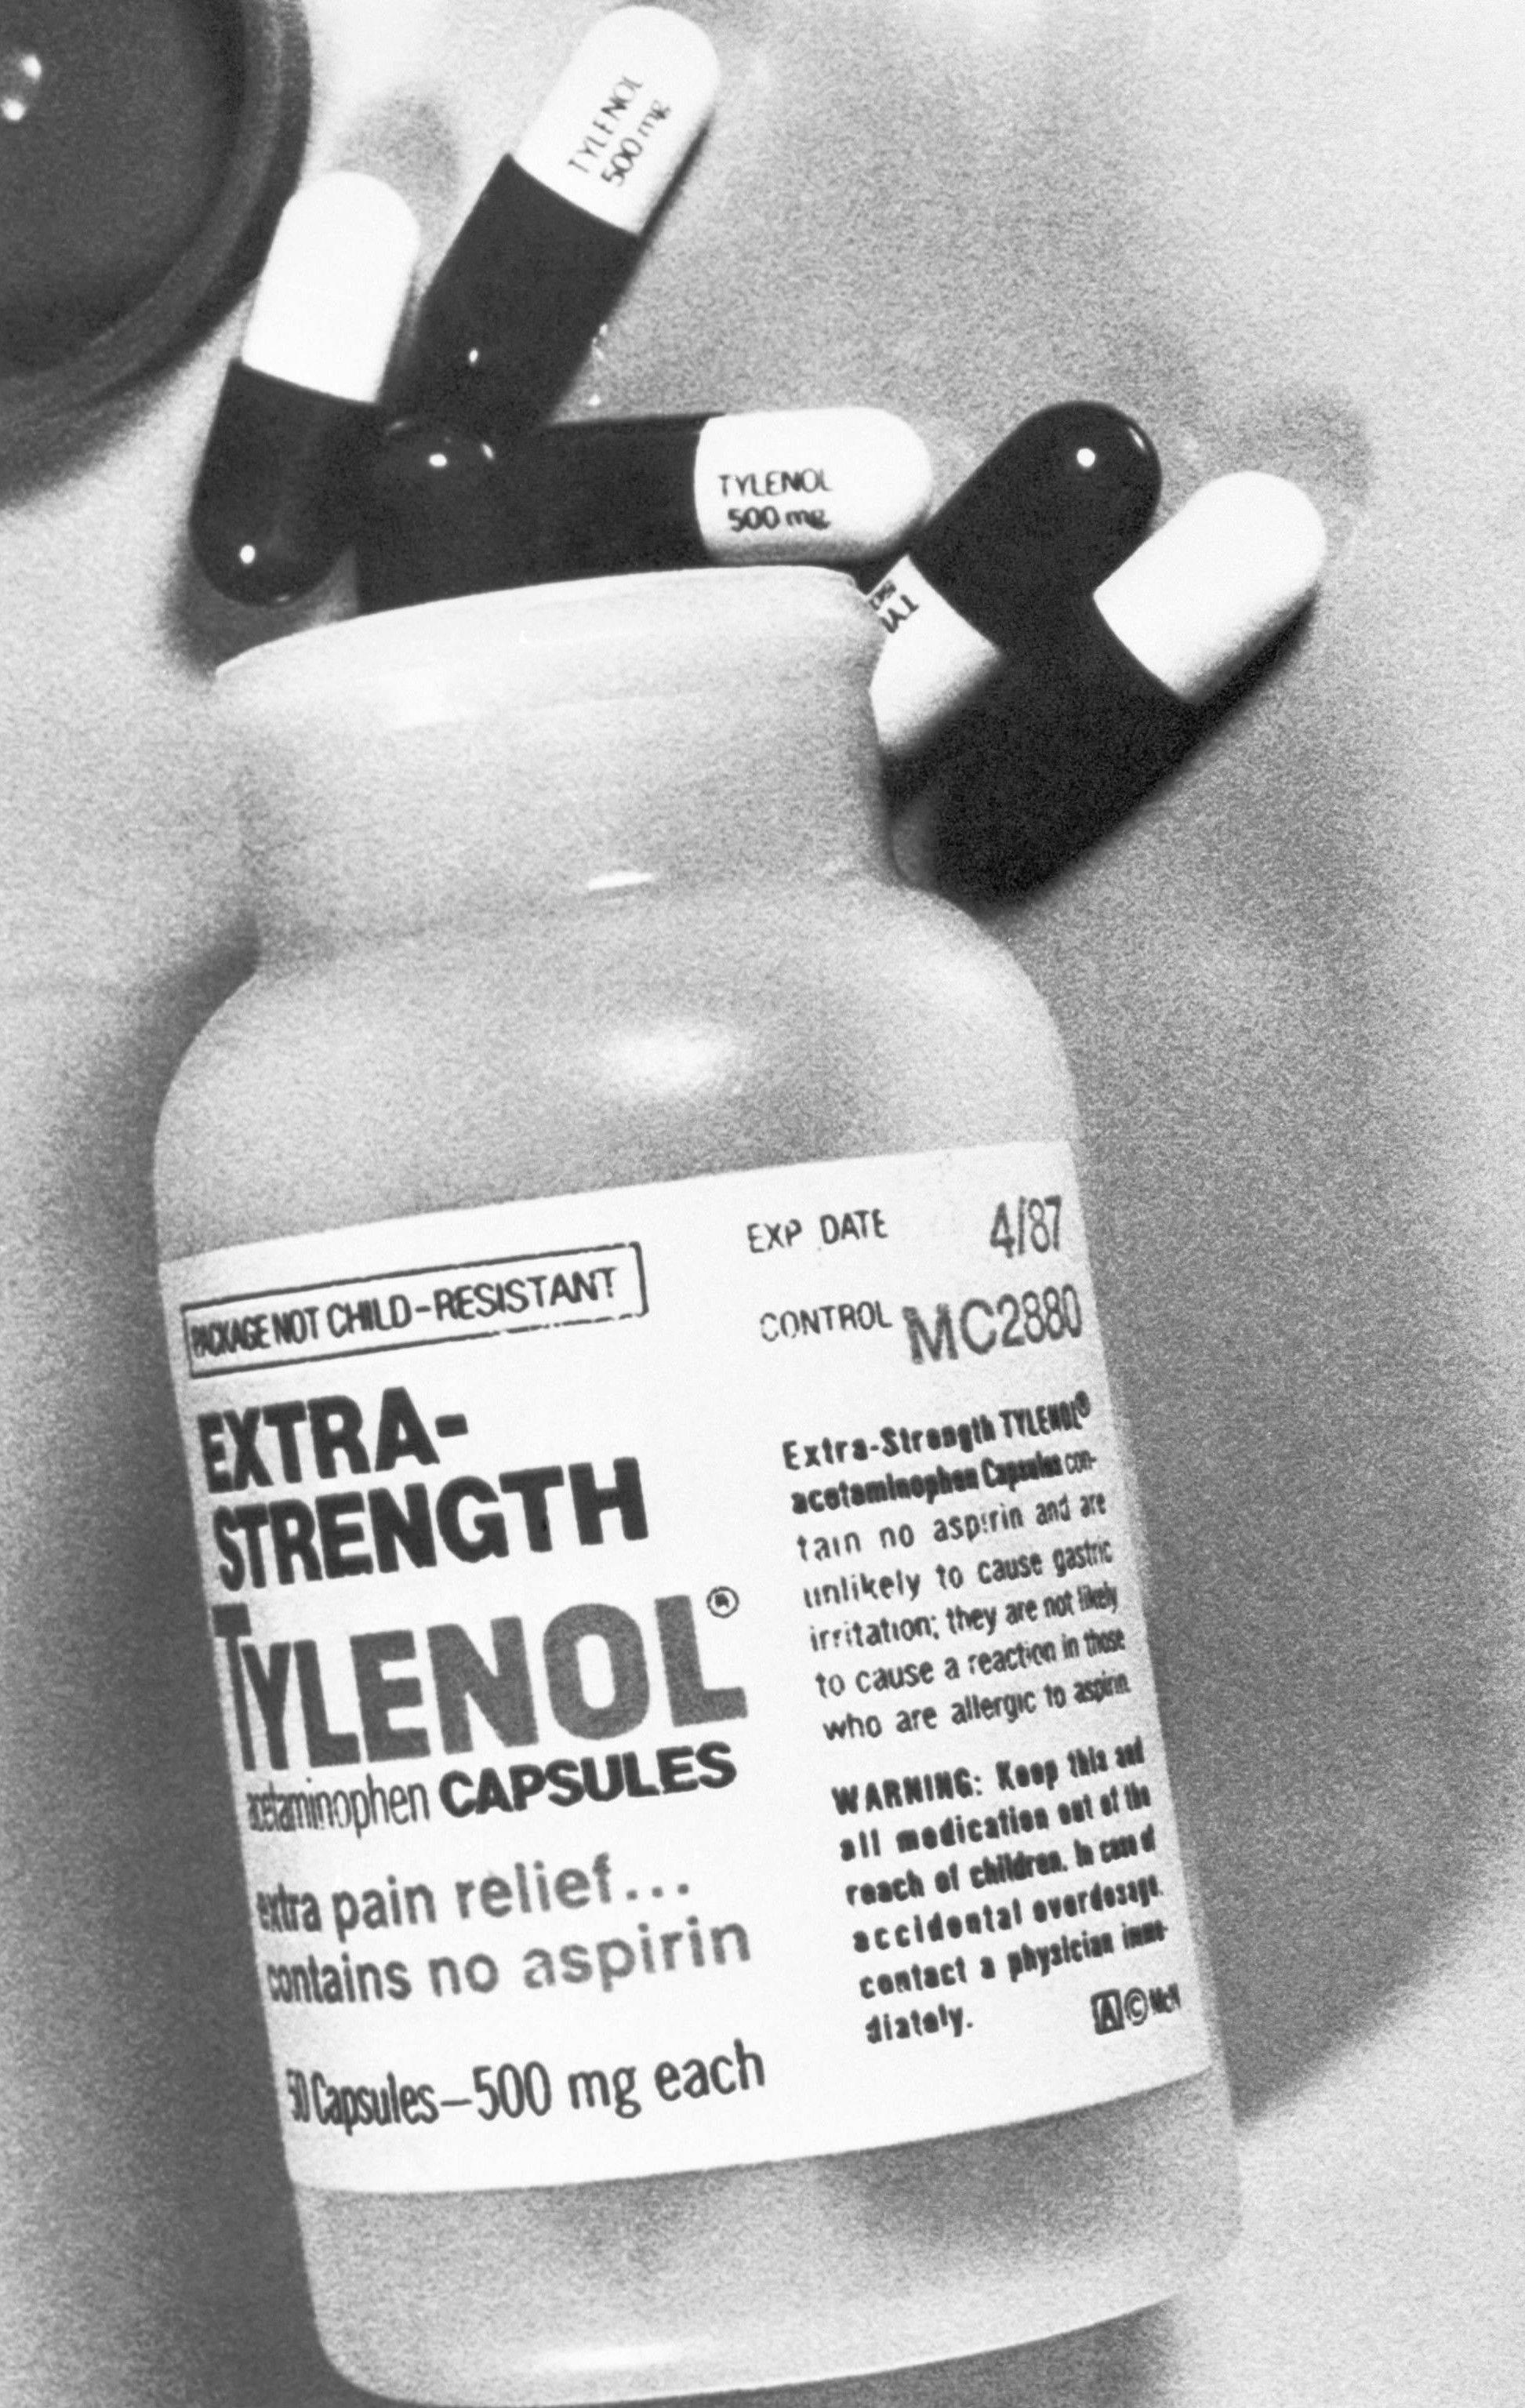 how to open tylenol extra strength bottle